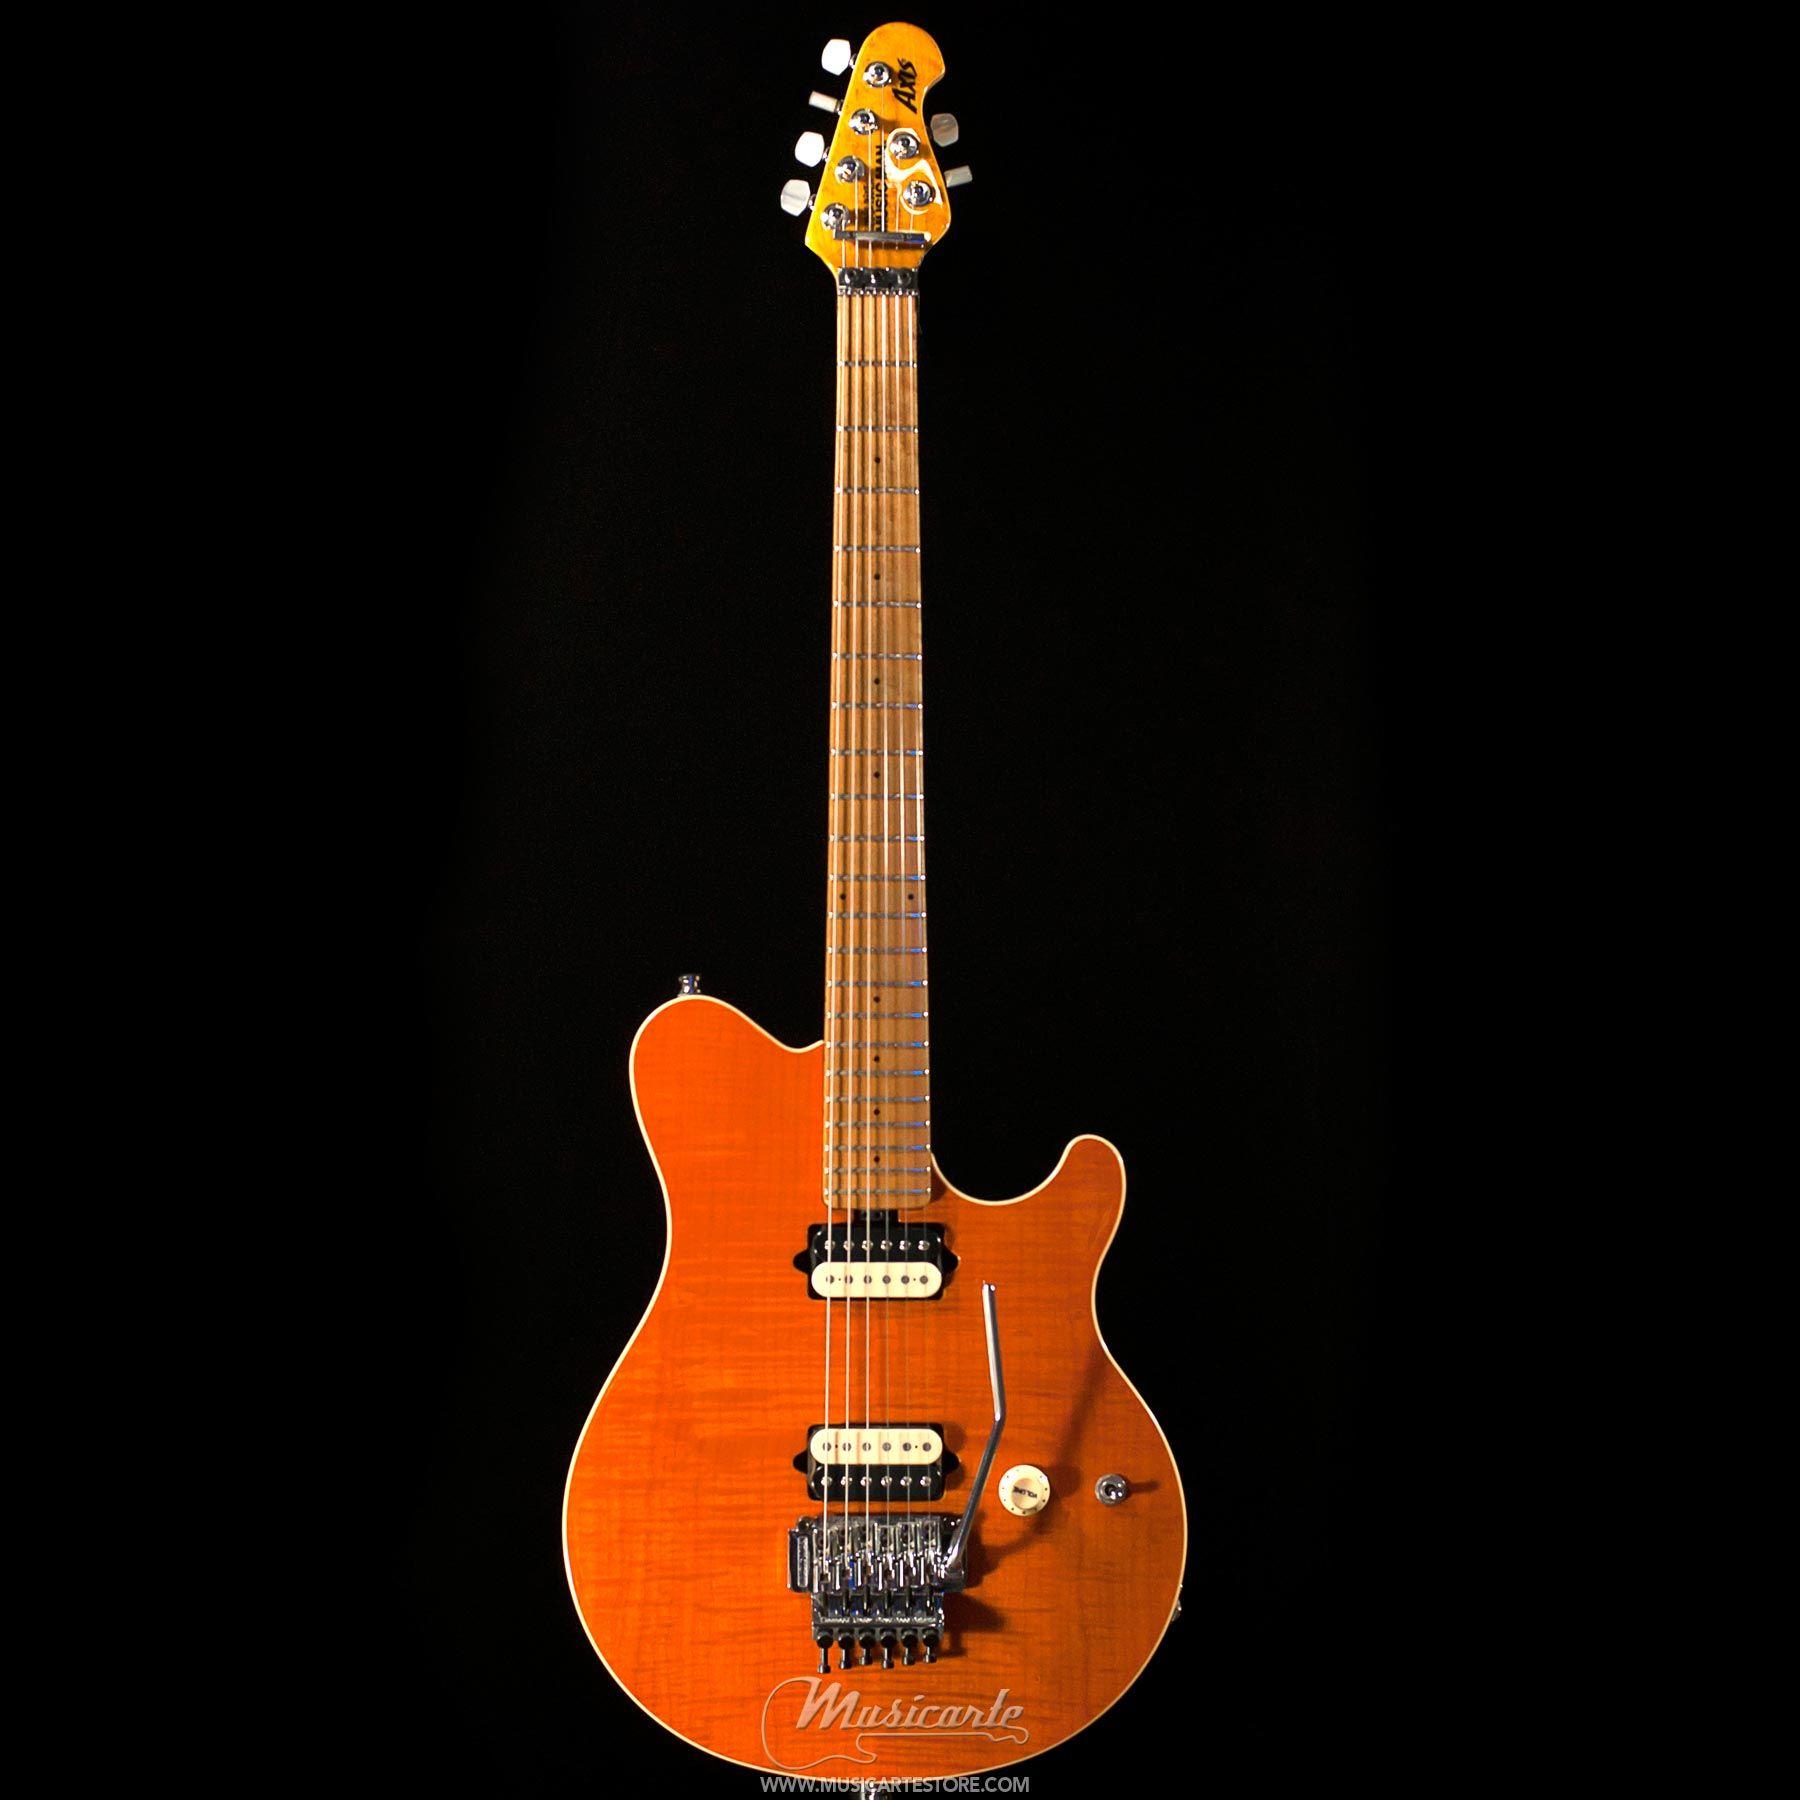 Music Man Axis Traslucent Gold Matching Headstock Chitarra Elettrica - Musicarte strumenti musicali